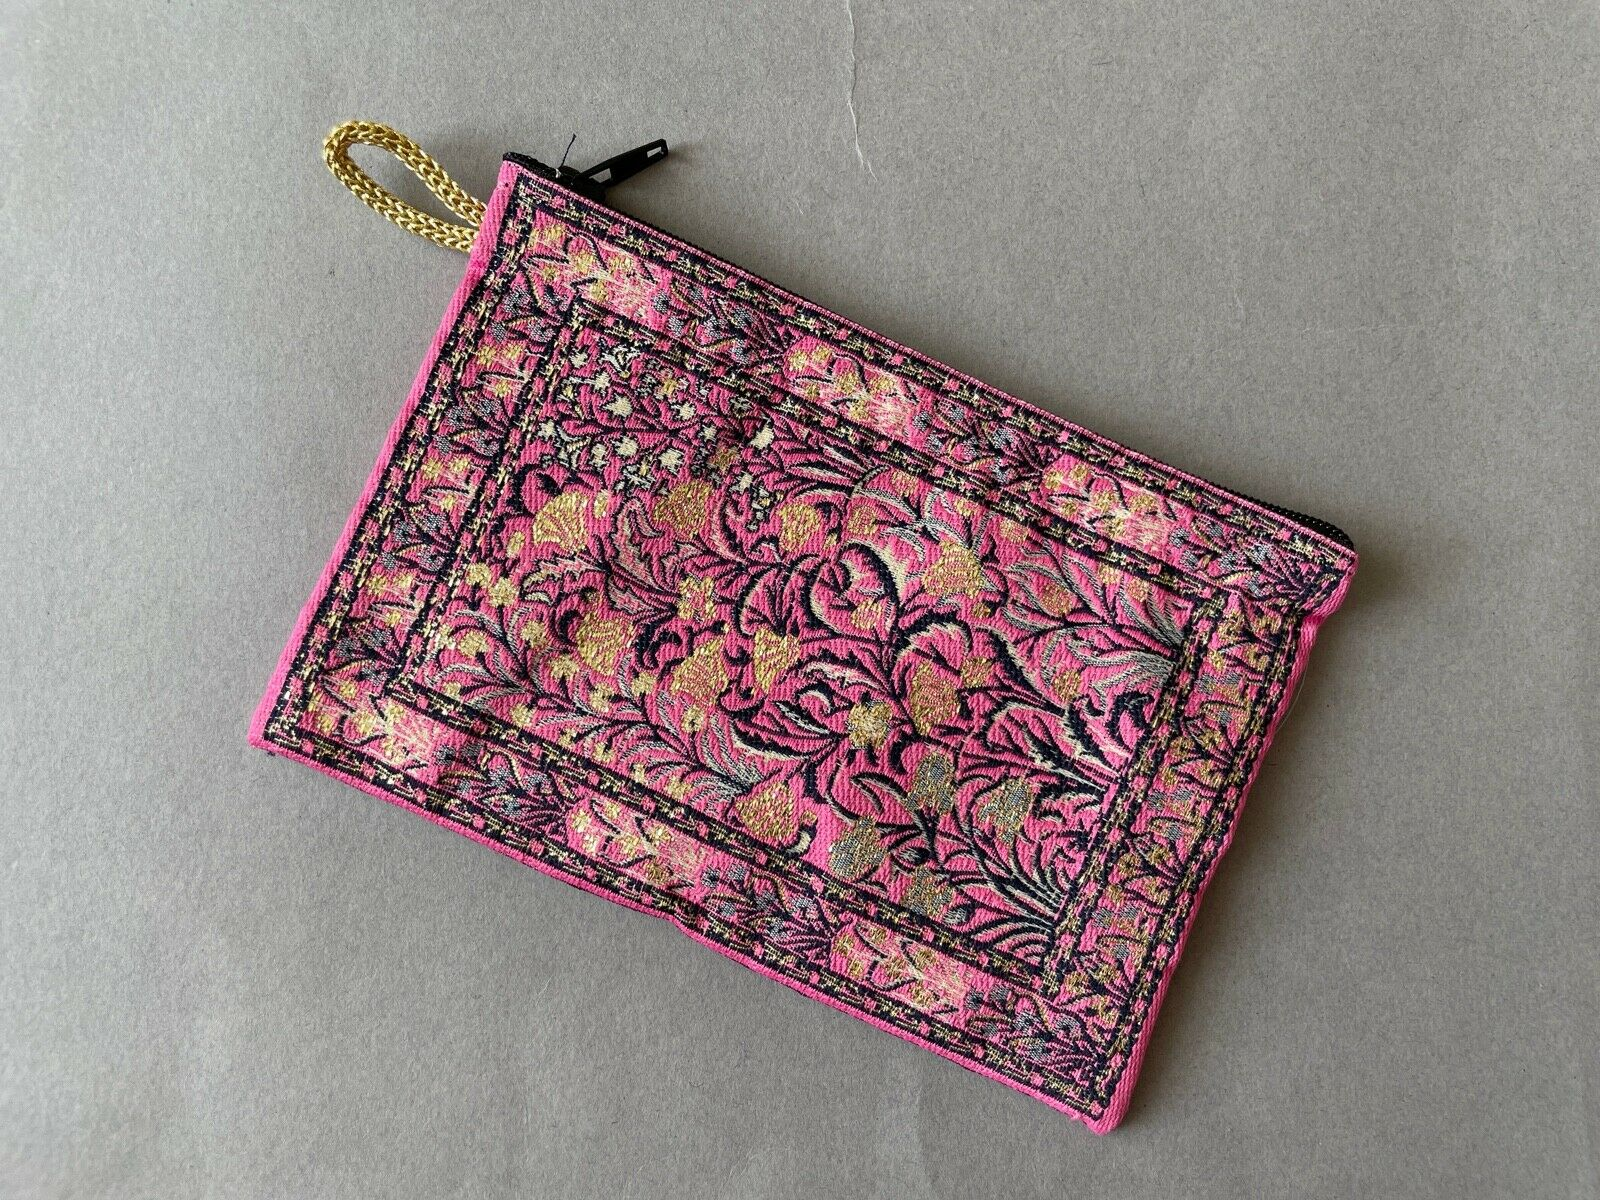 Kilim Coin Purse, Small Make-up Bag, ID/Card/Oyster Holder, Cheap Gift Idea